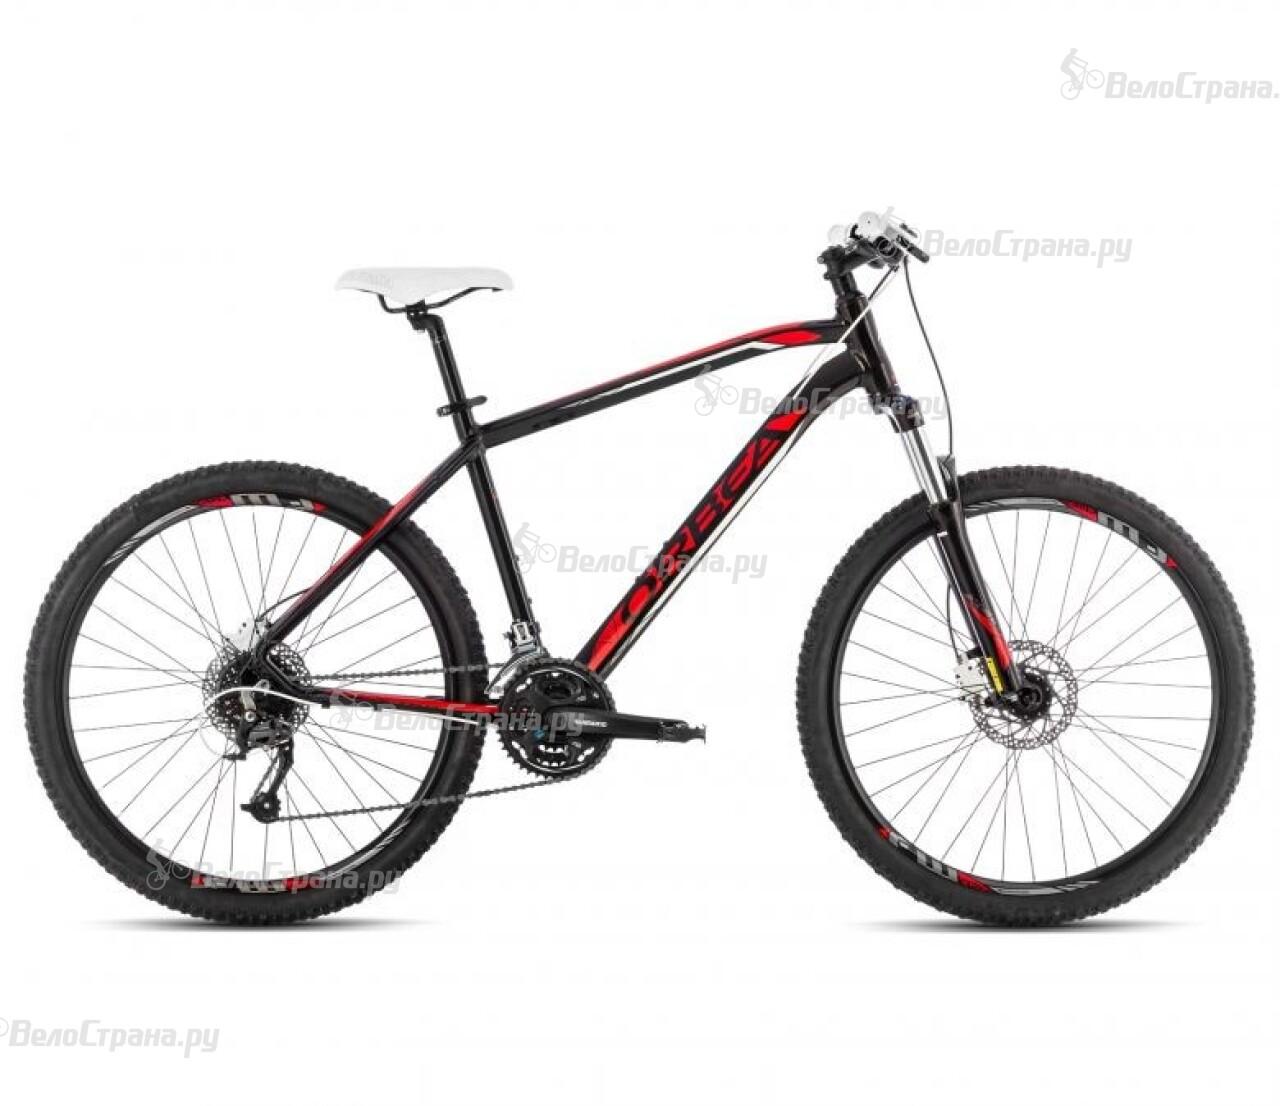 Велосипед Orbea Mx 26 30 Dama (2014) велосипед orbea mx 24 xc 2014